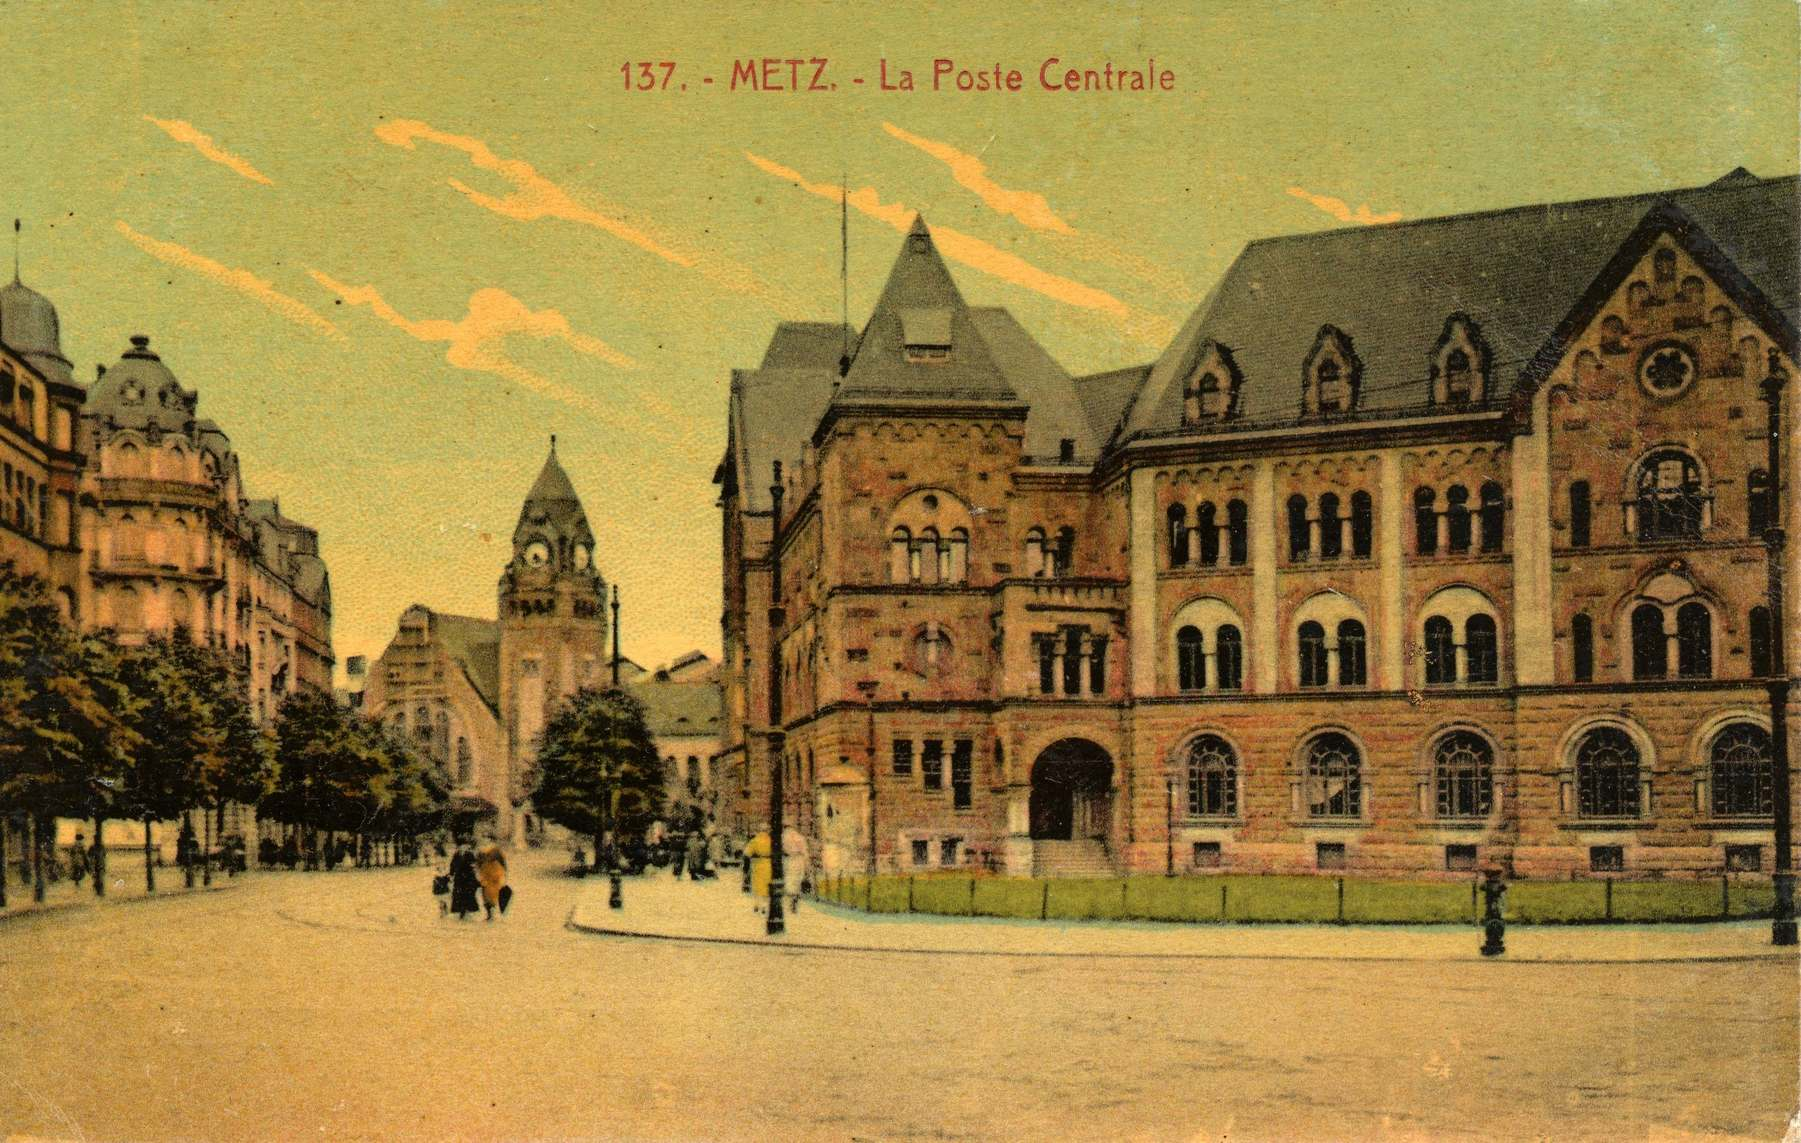 Contenu du Metz. La Gare centrale